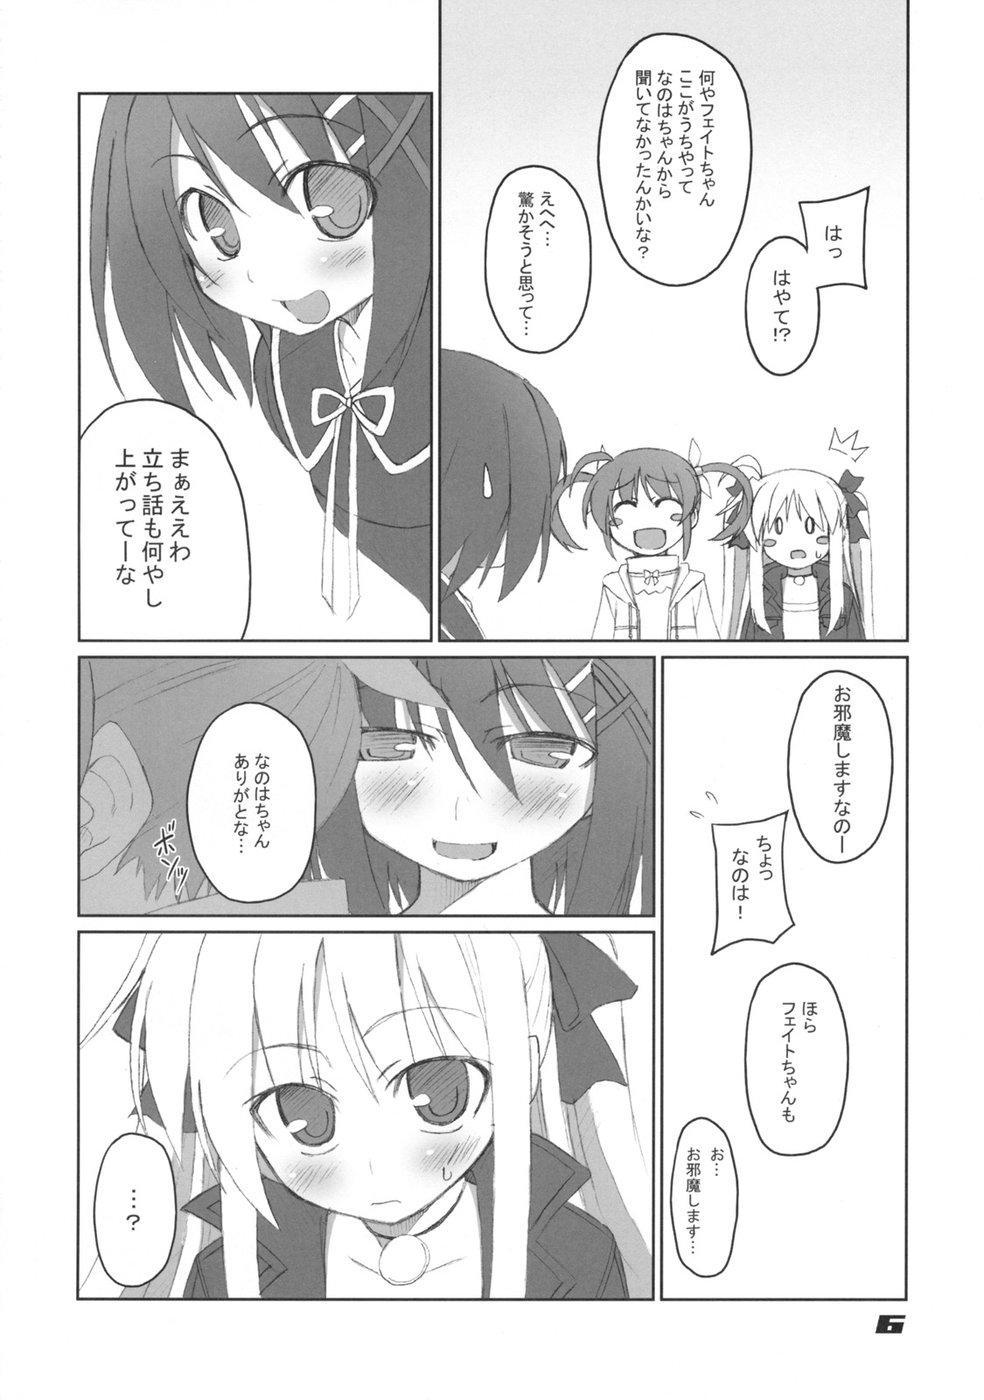 Fate-chan Igai to Moroi no A's 5